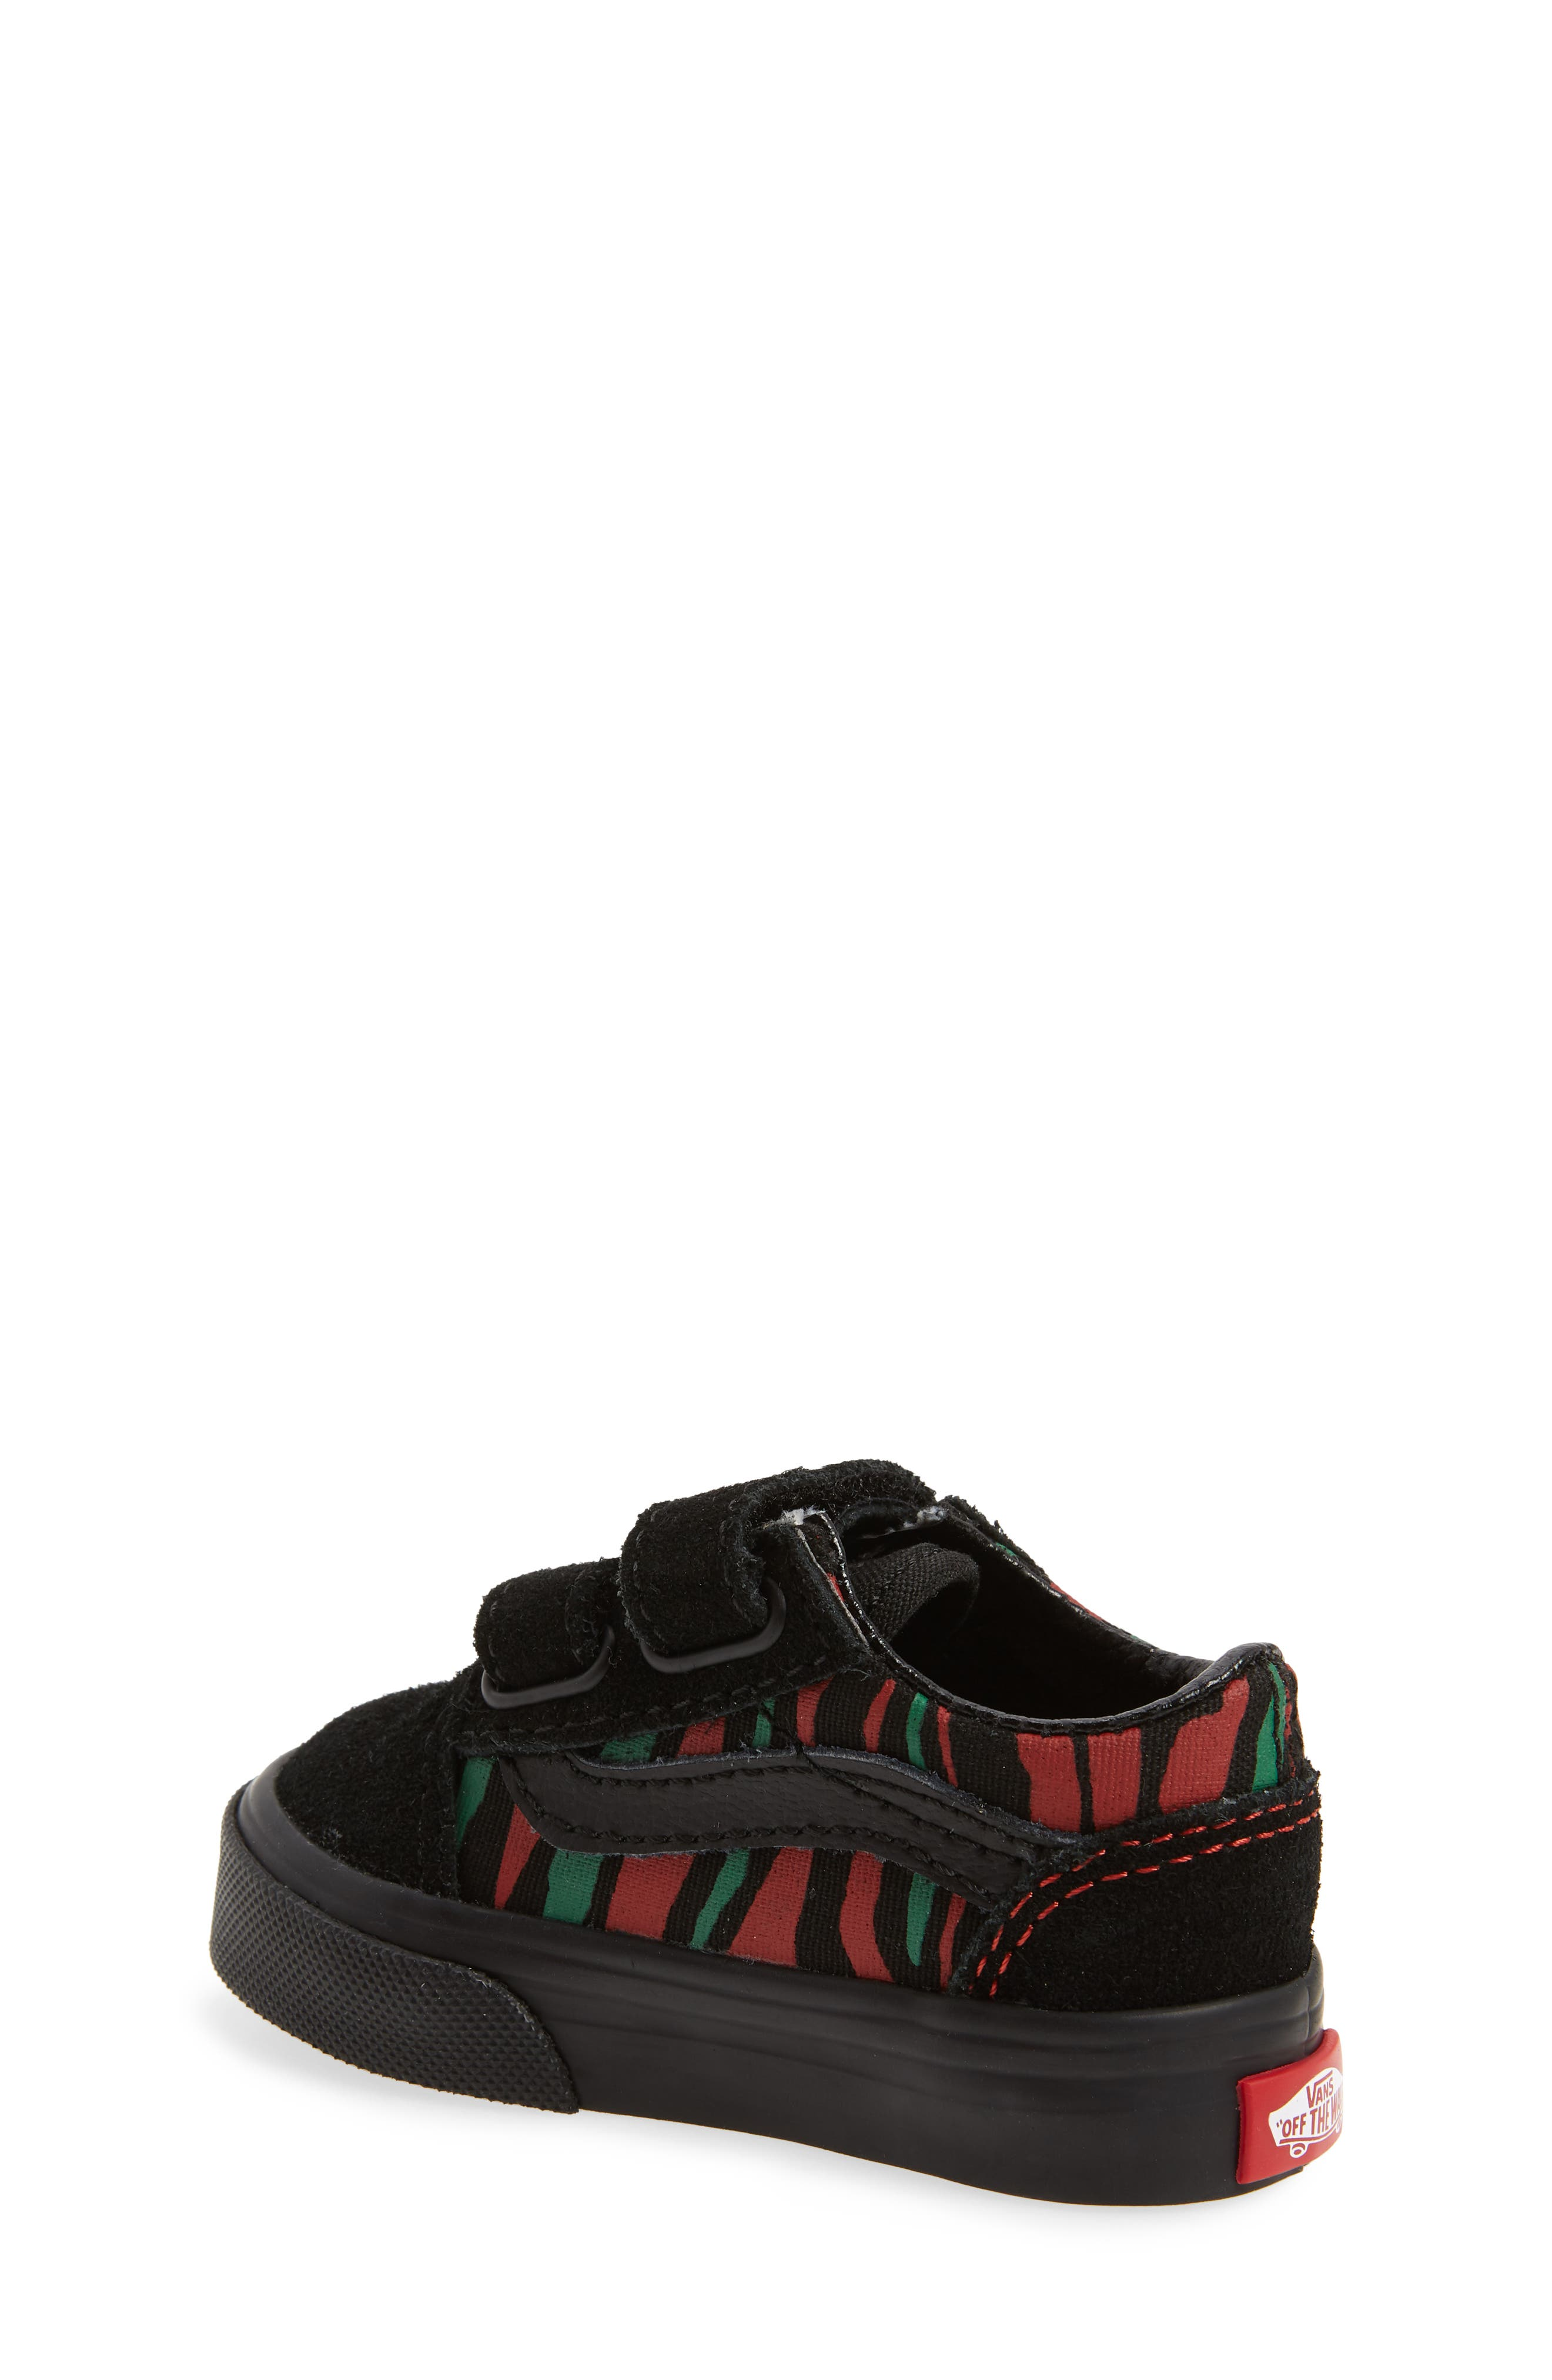 Old Skool V Sneaker,                             Alternate thumbnail 2, color,                             Black